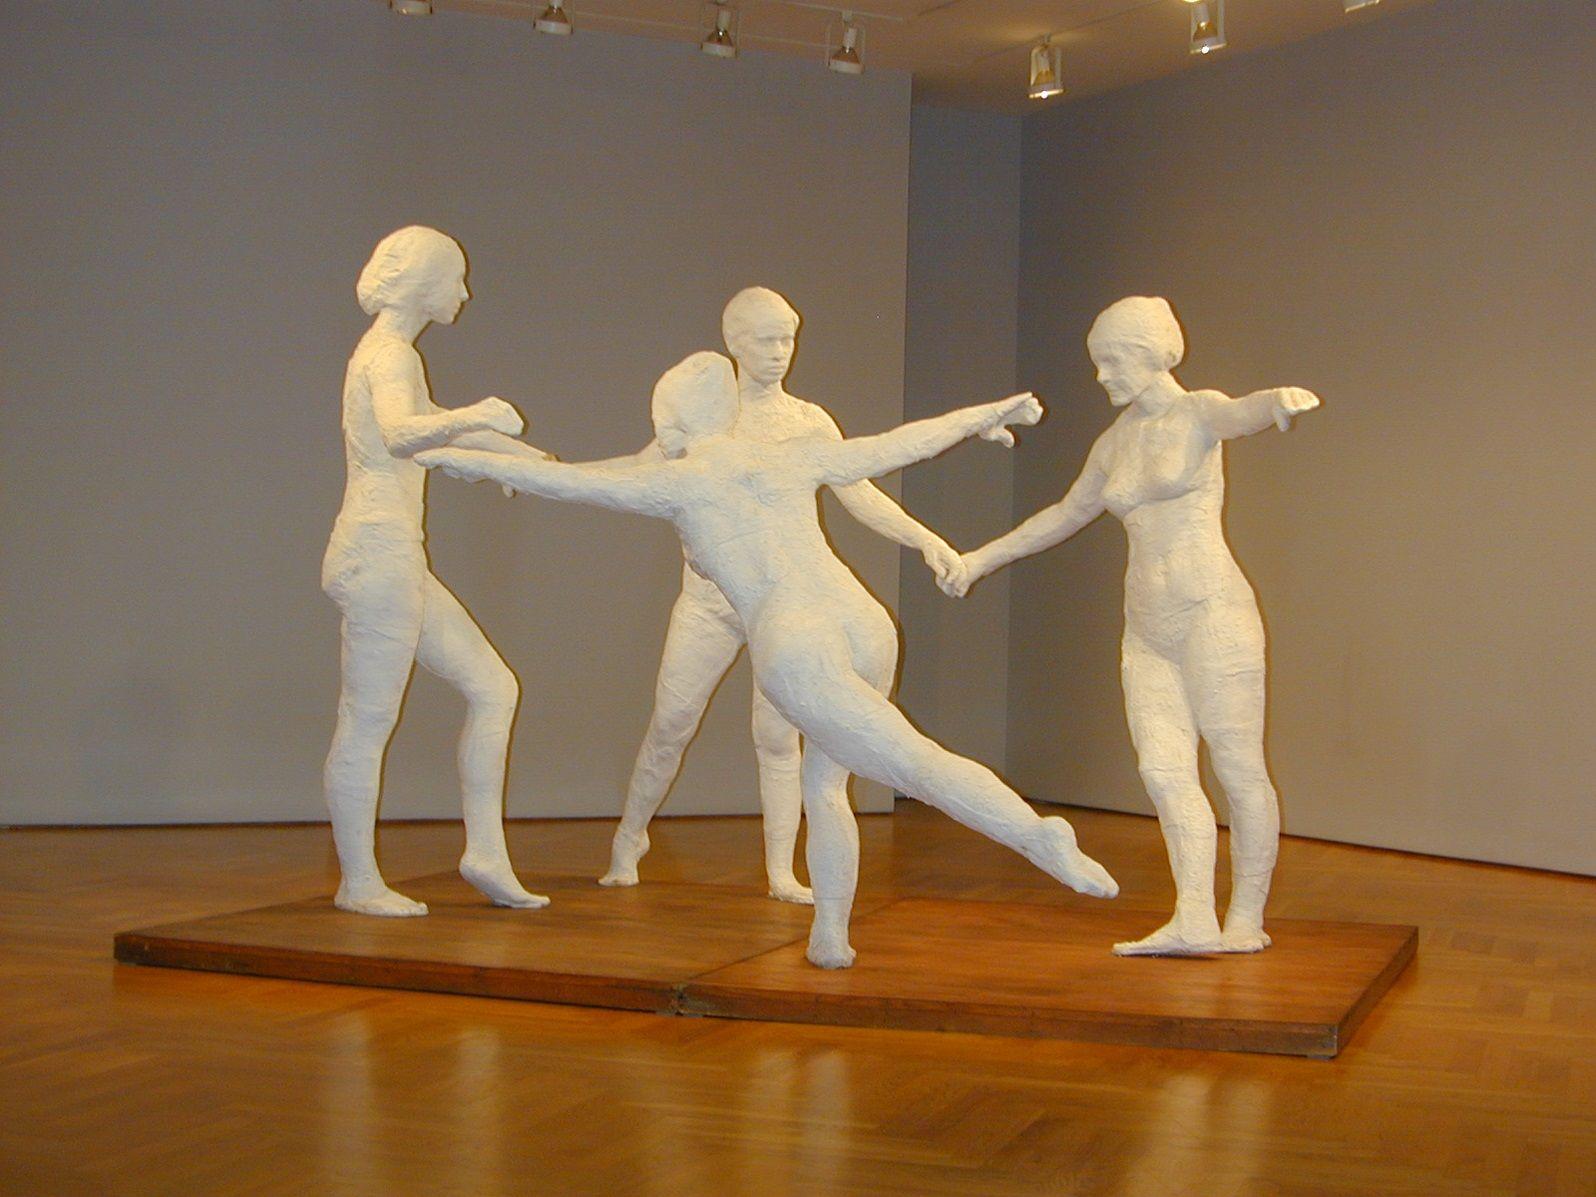 GEORGE SEGAL The Dancers